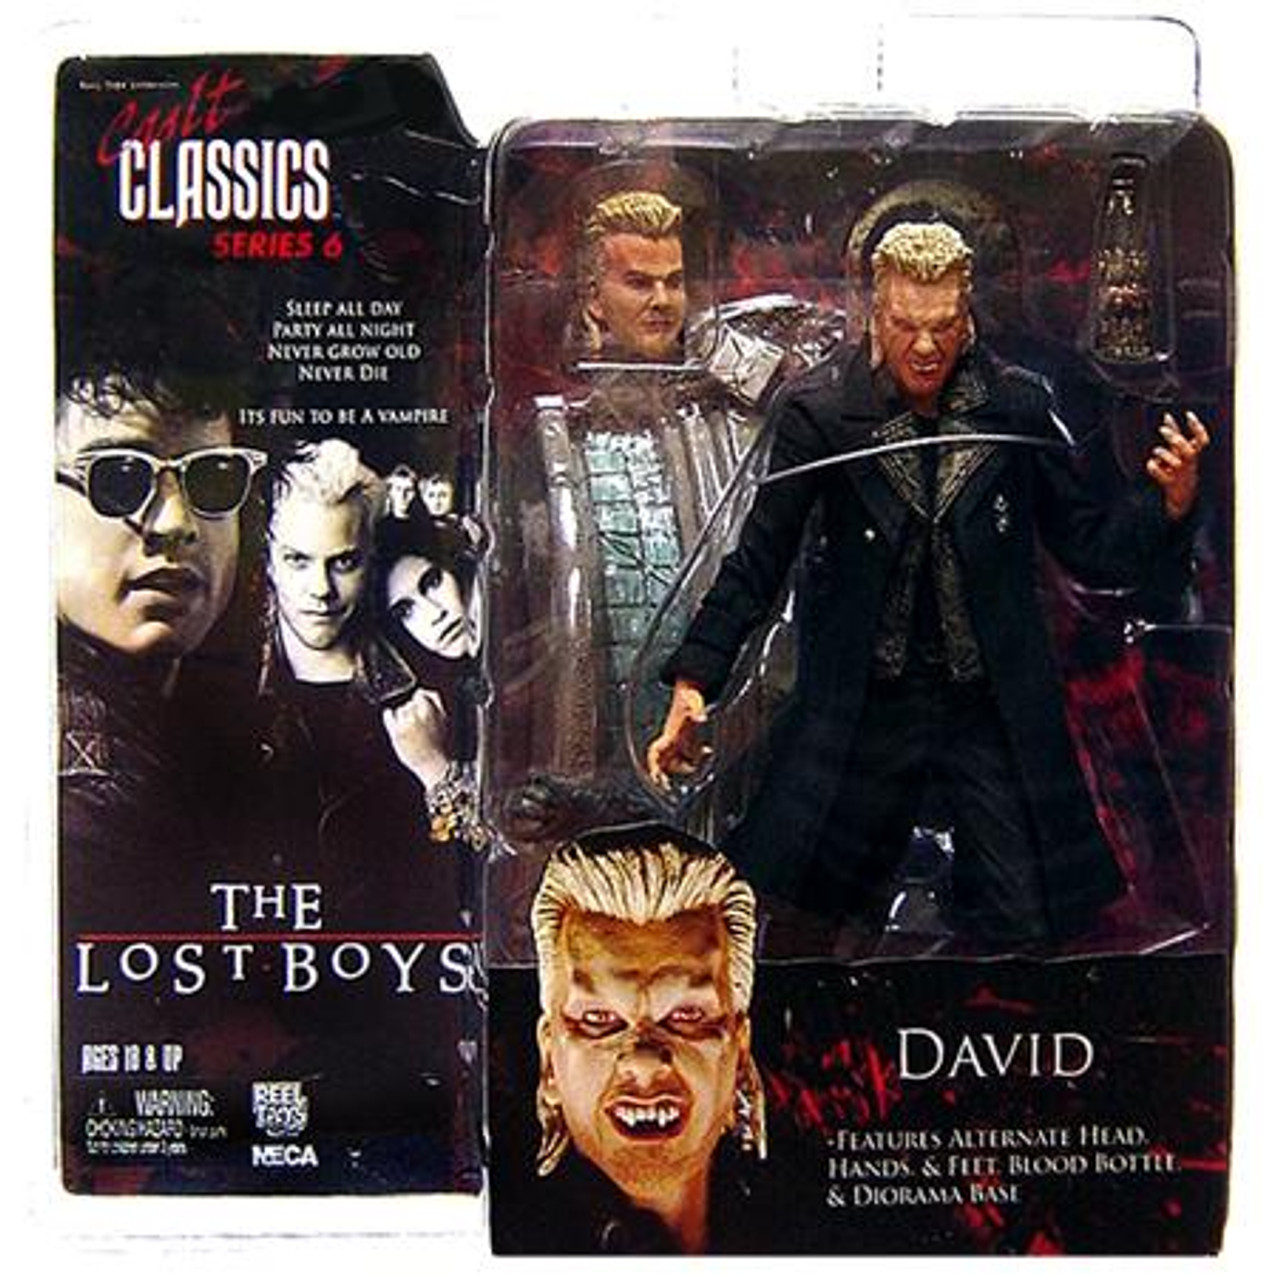 NECA The Lost Boys Cult Classics Series 6 David Action Figure